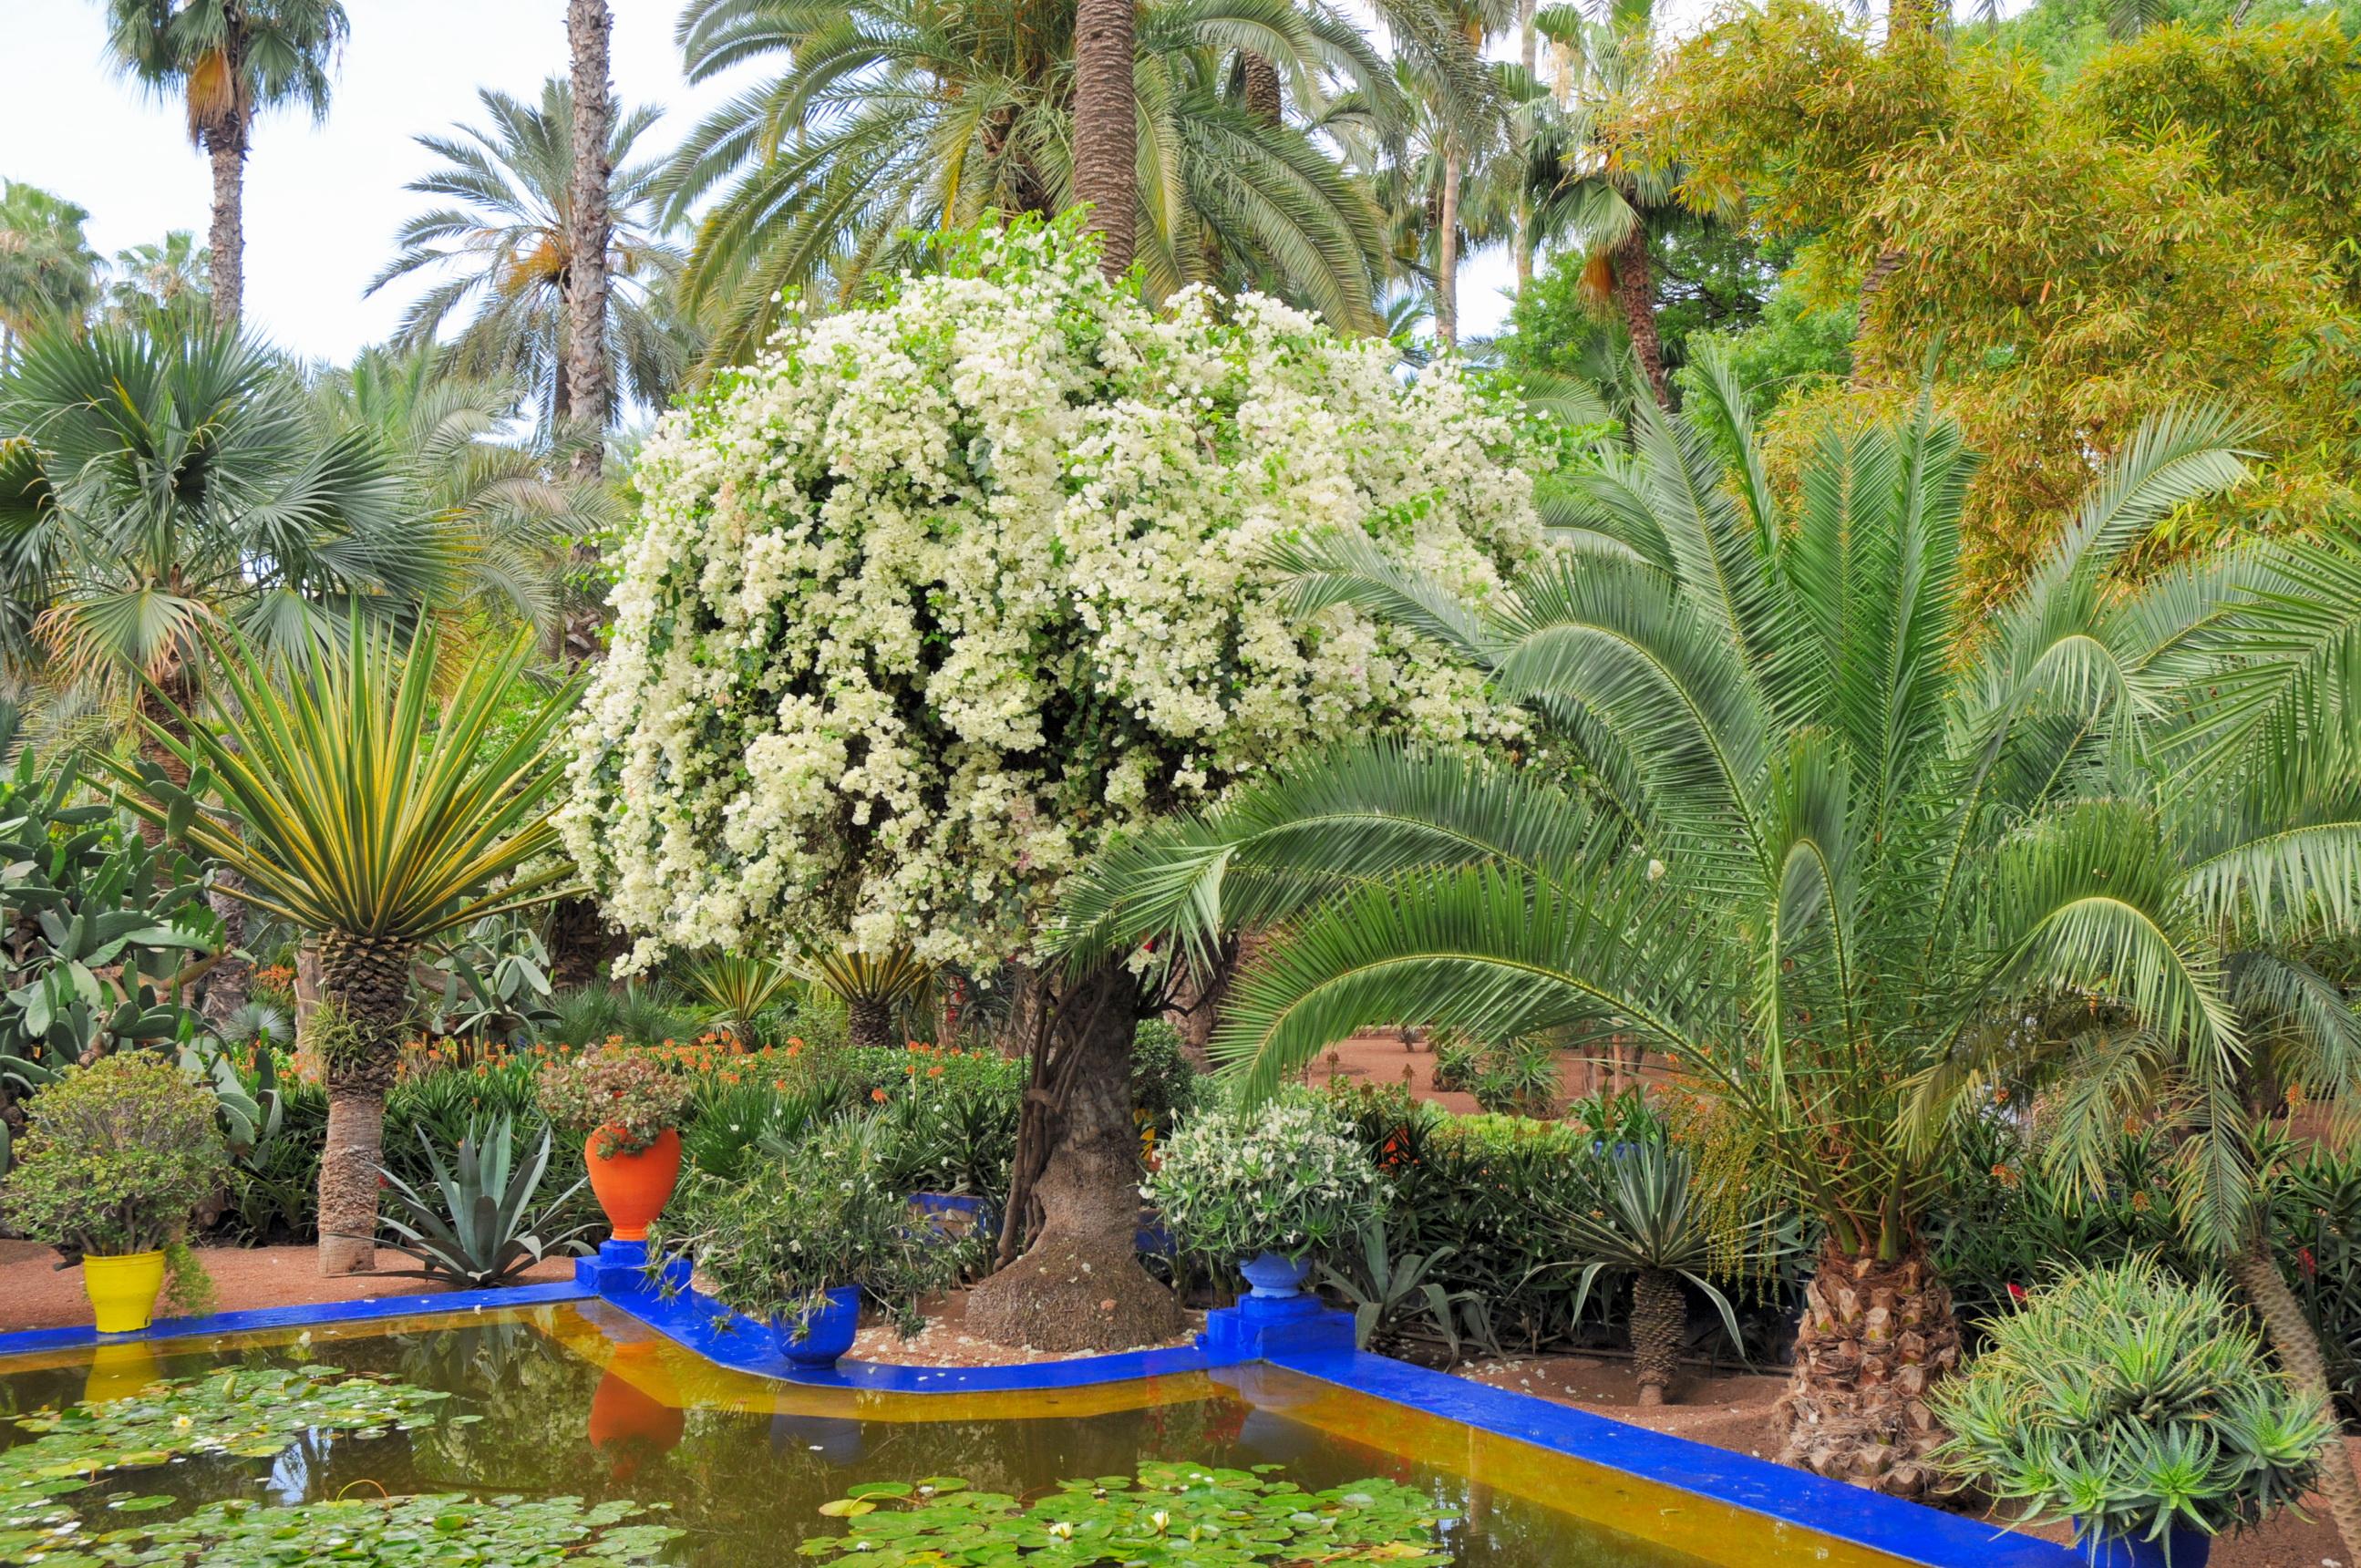 Fondos de pantalla jard ns morocco marrakech jardin for Jardin marrakech